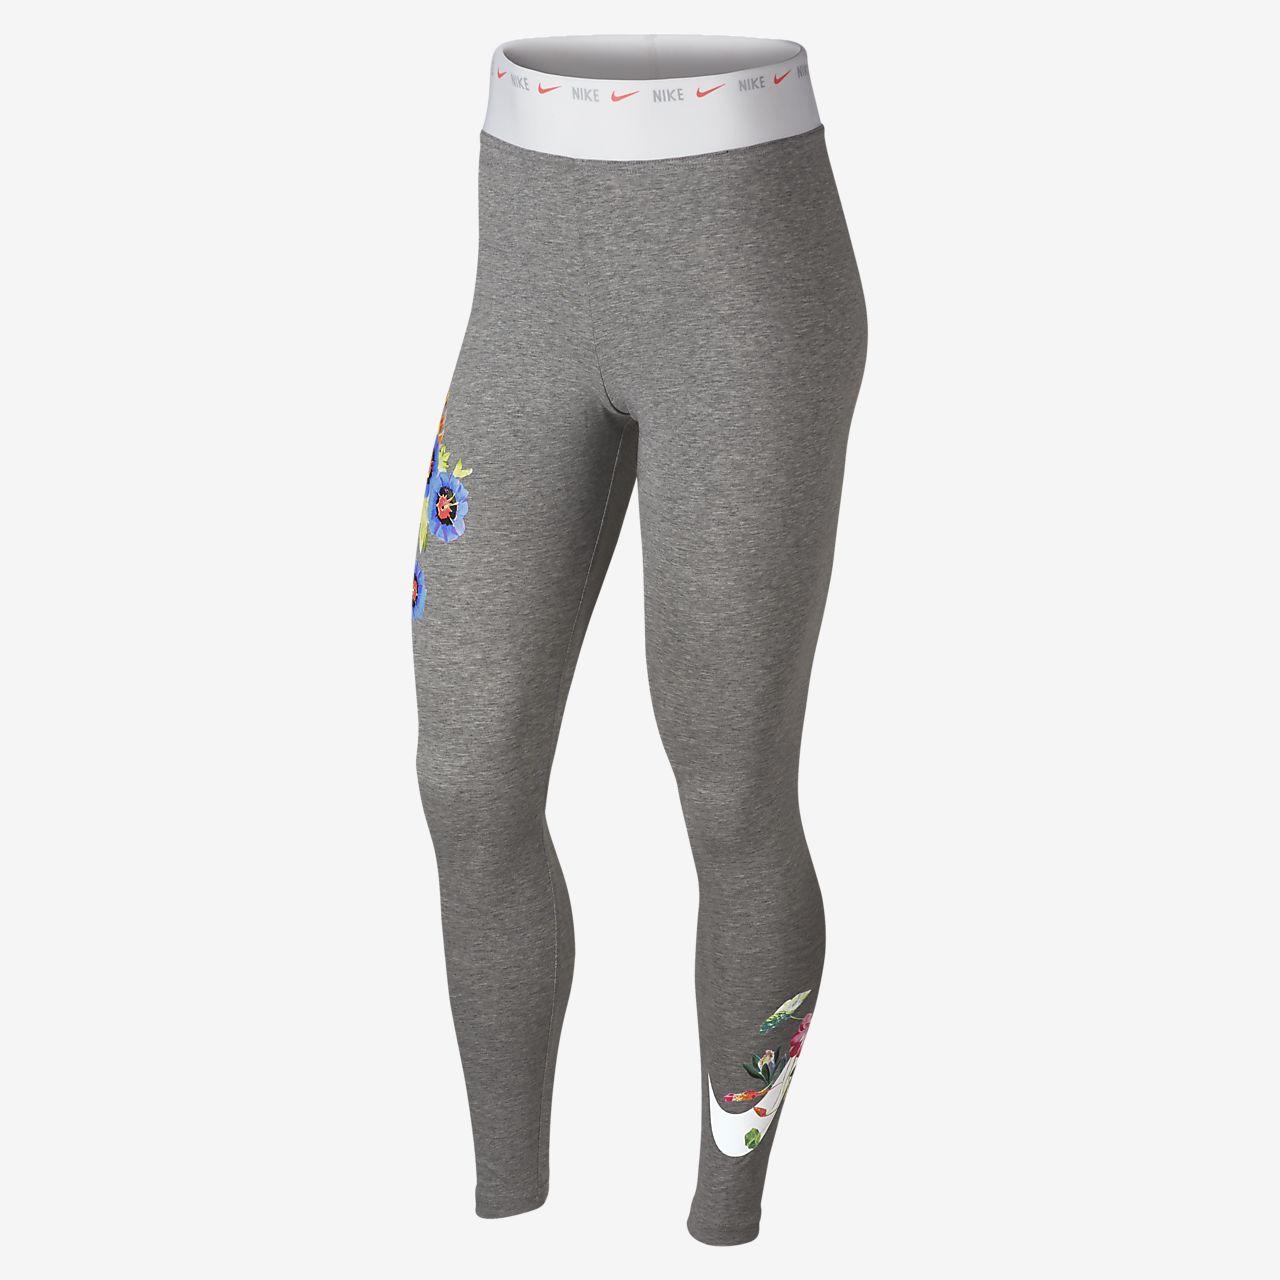 Leggings com grafismo Nike Sportswear para mulher